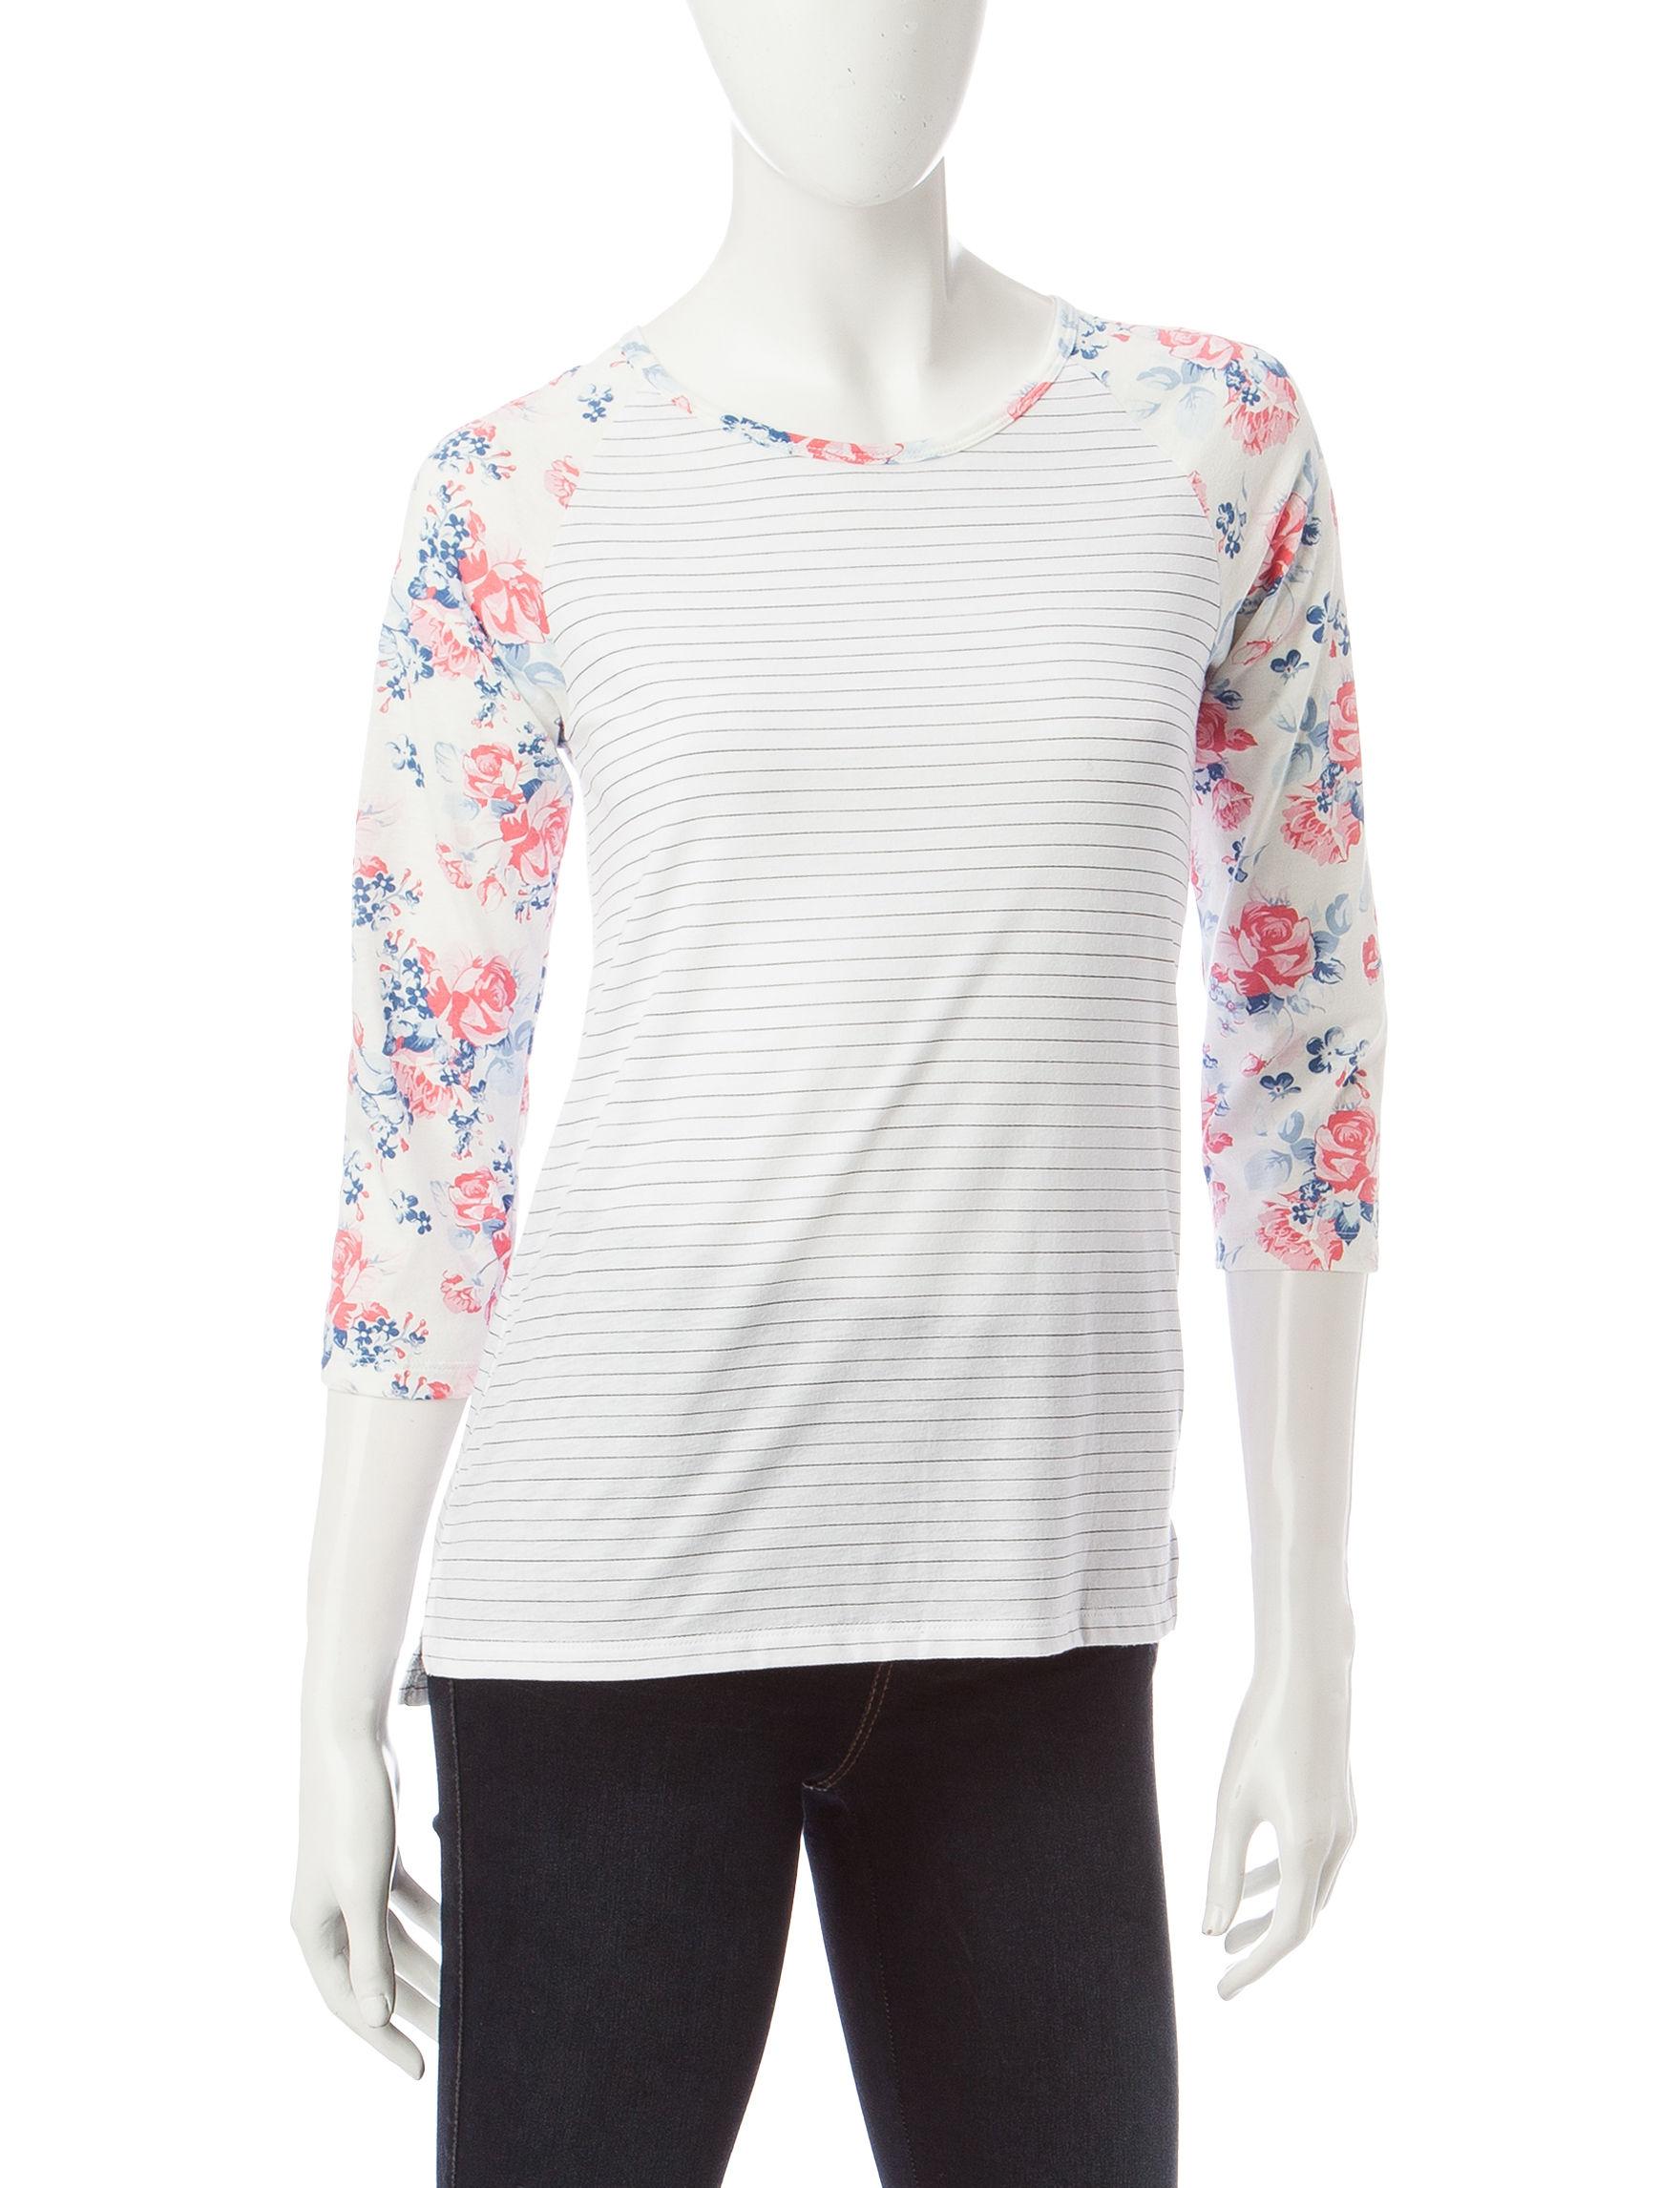 Wishful Park White Shirts & Blouses